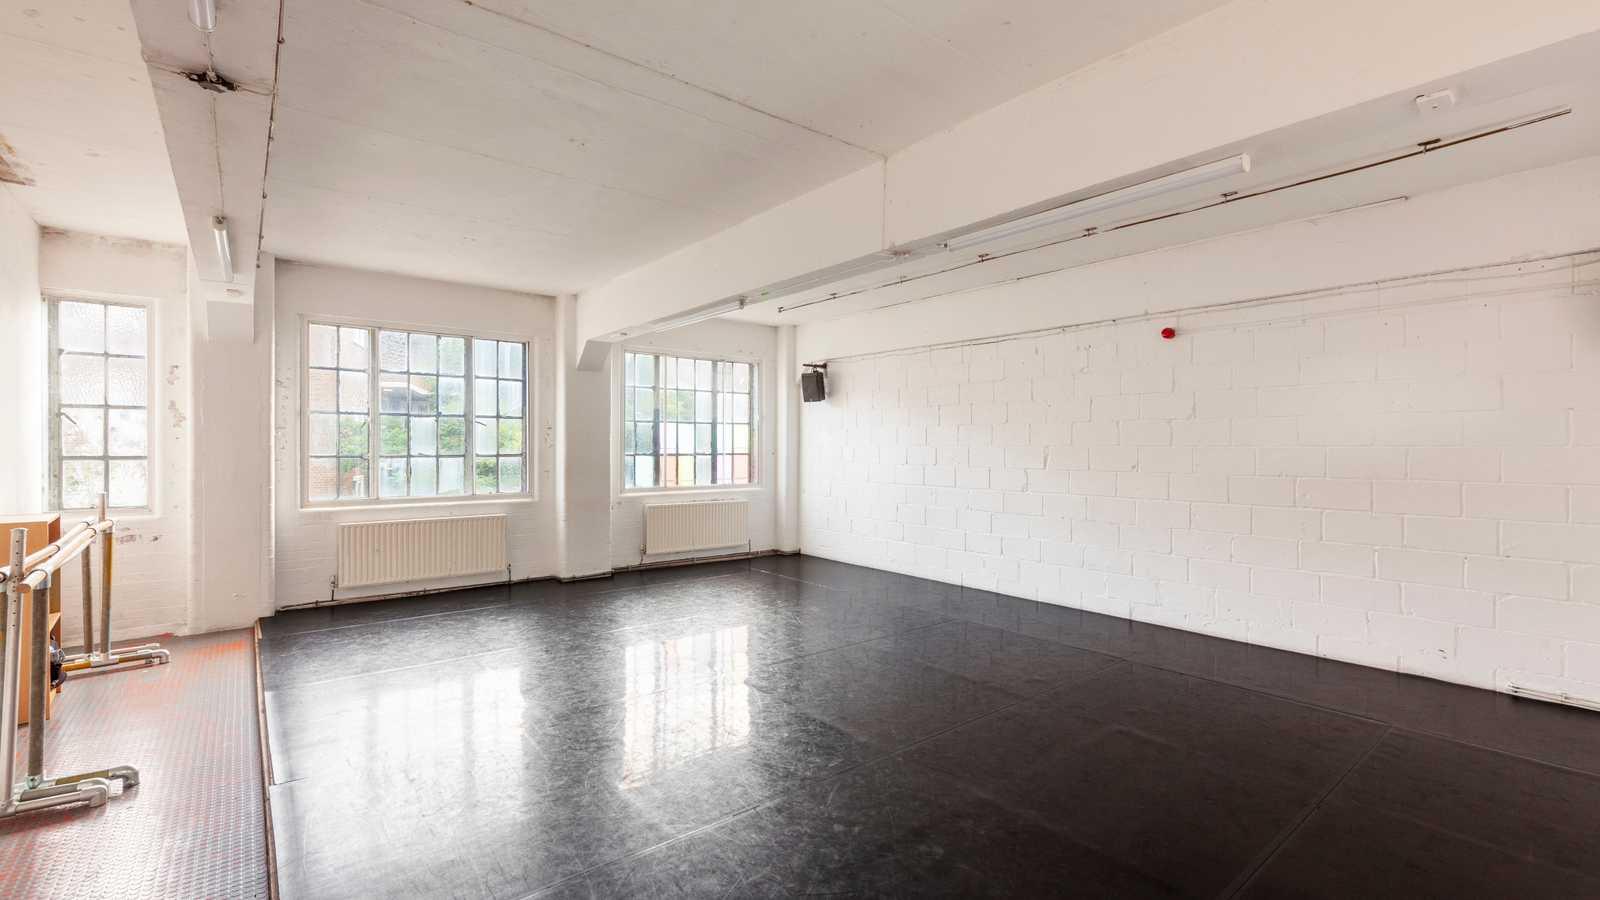 Chisenhale Dance Space: Rehearsal Studio